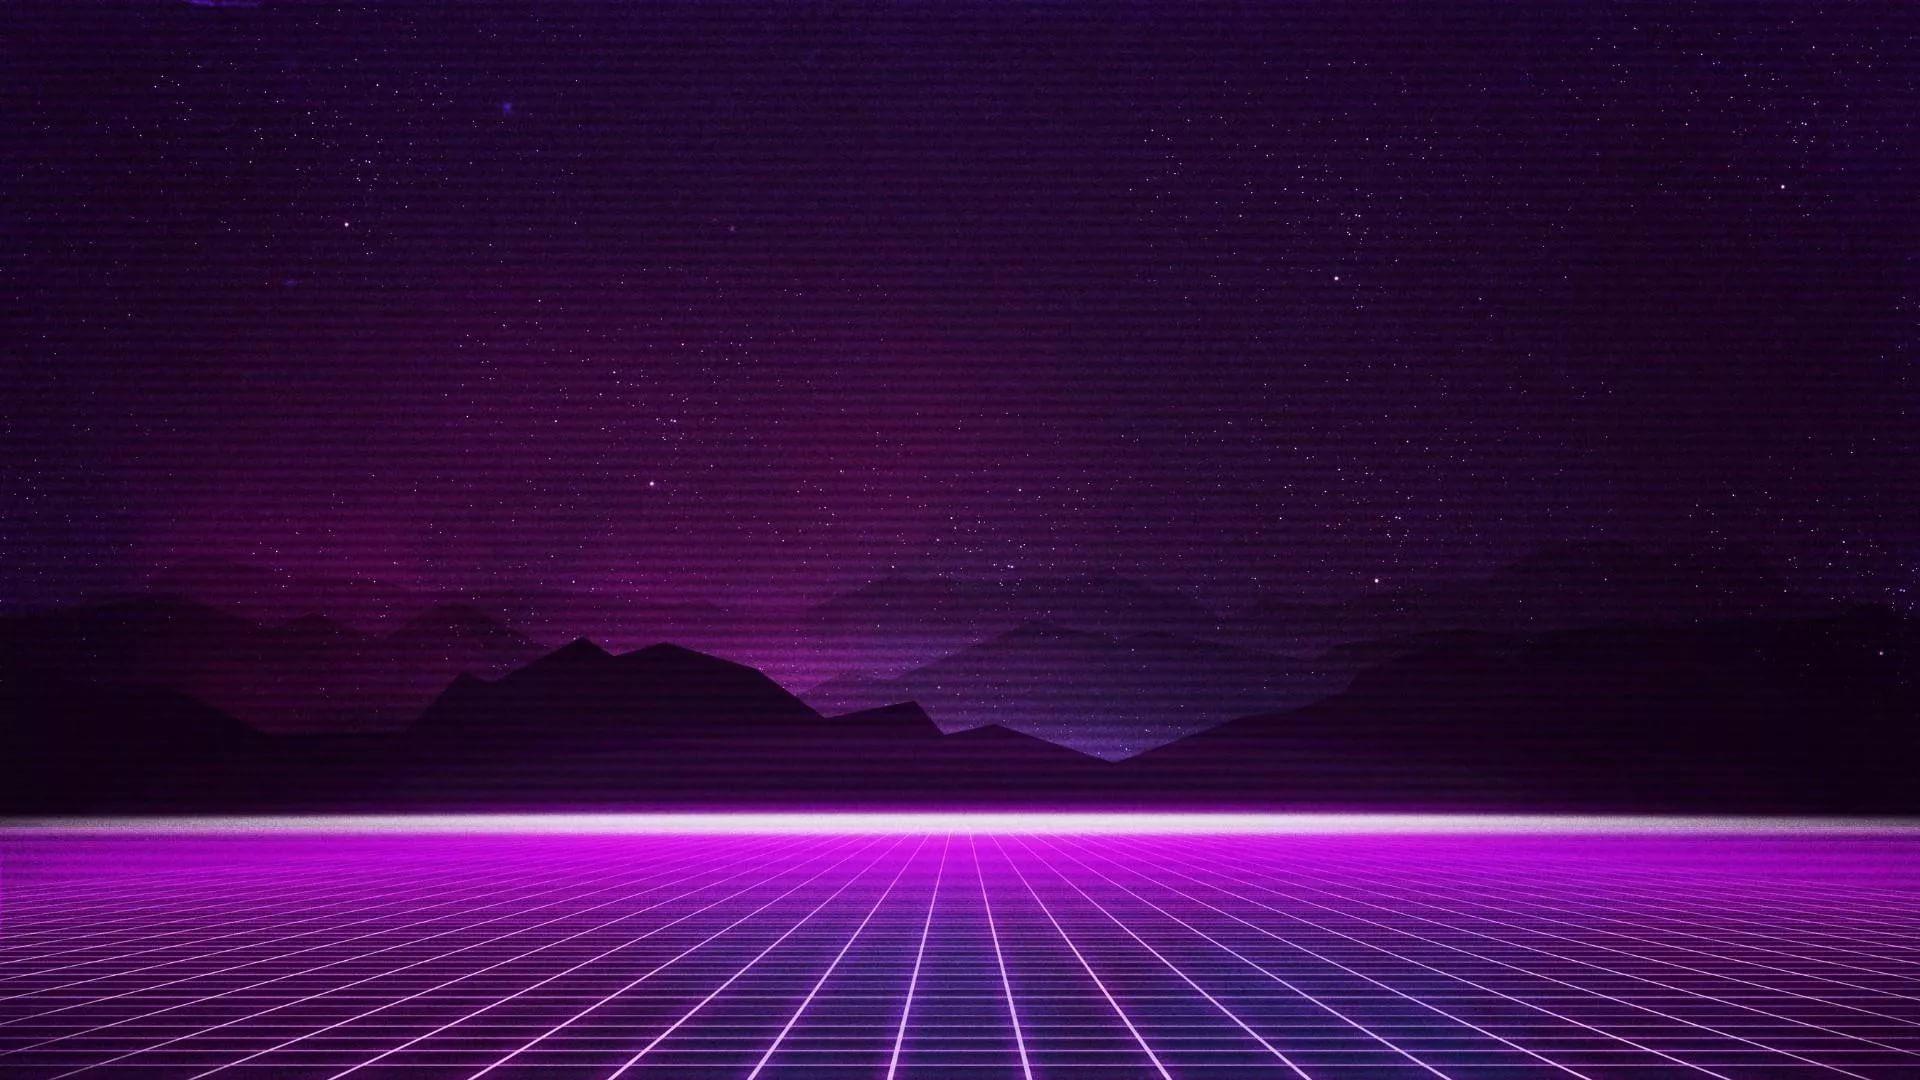 S Background Wallpaper HD